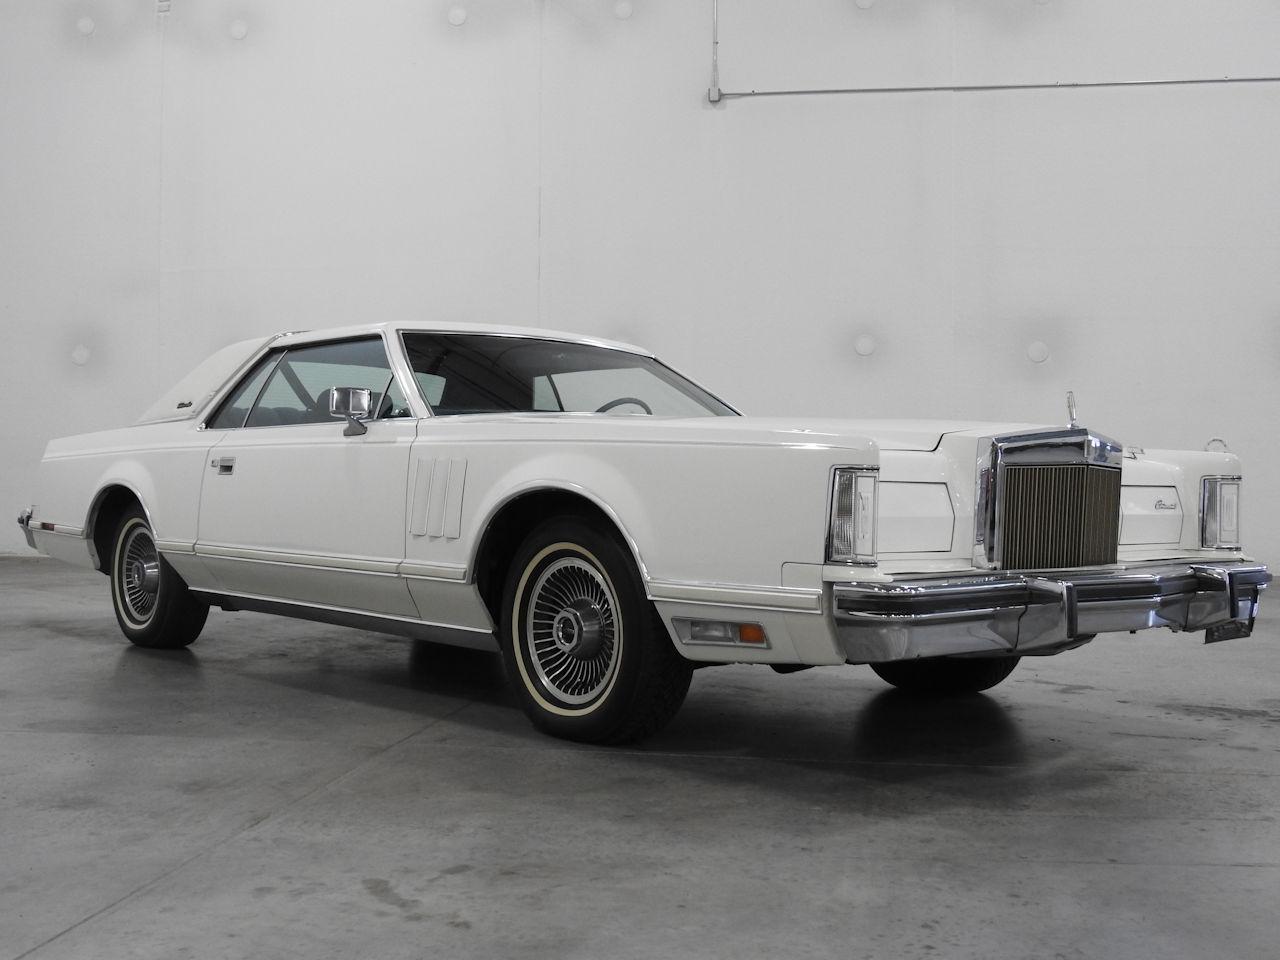 1979 Lincoln MKV 49